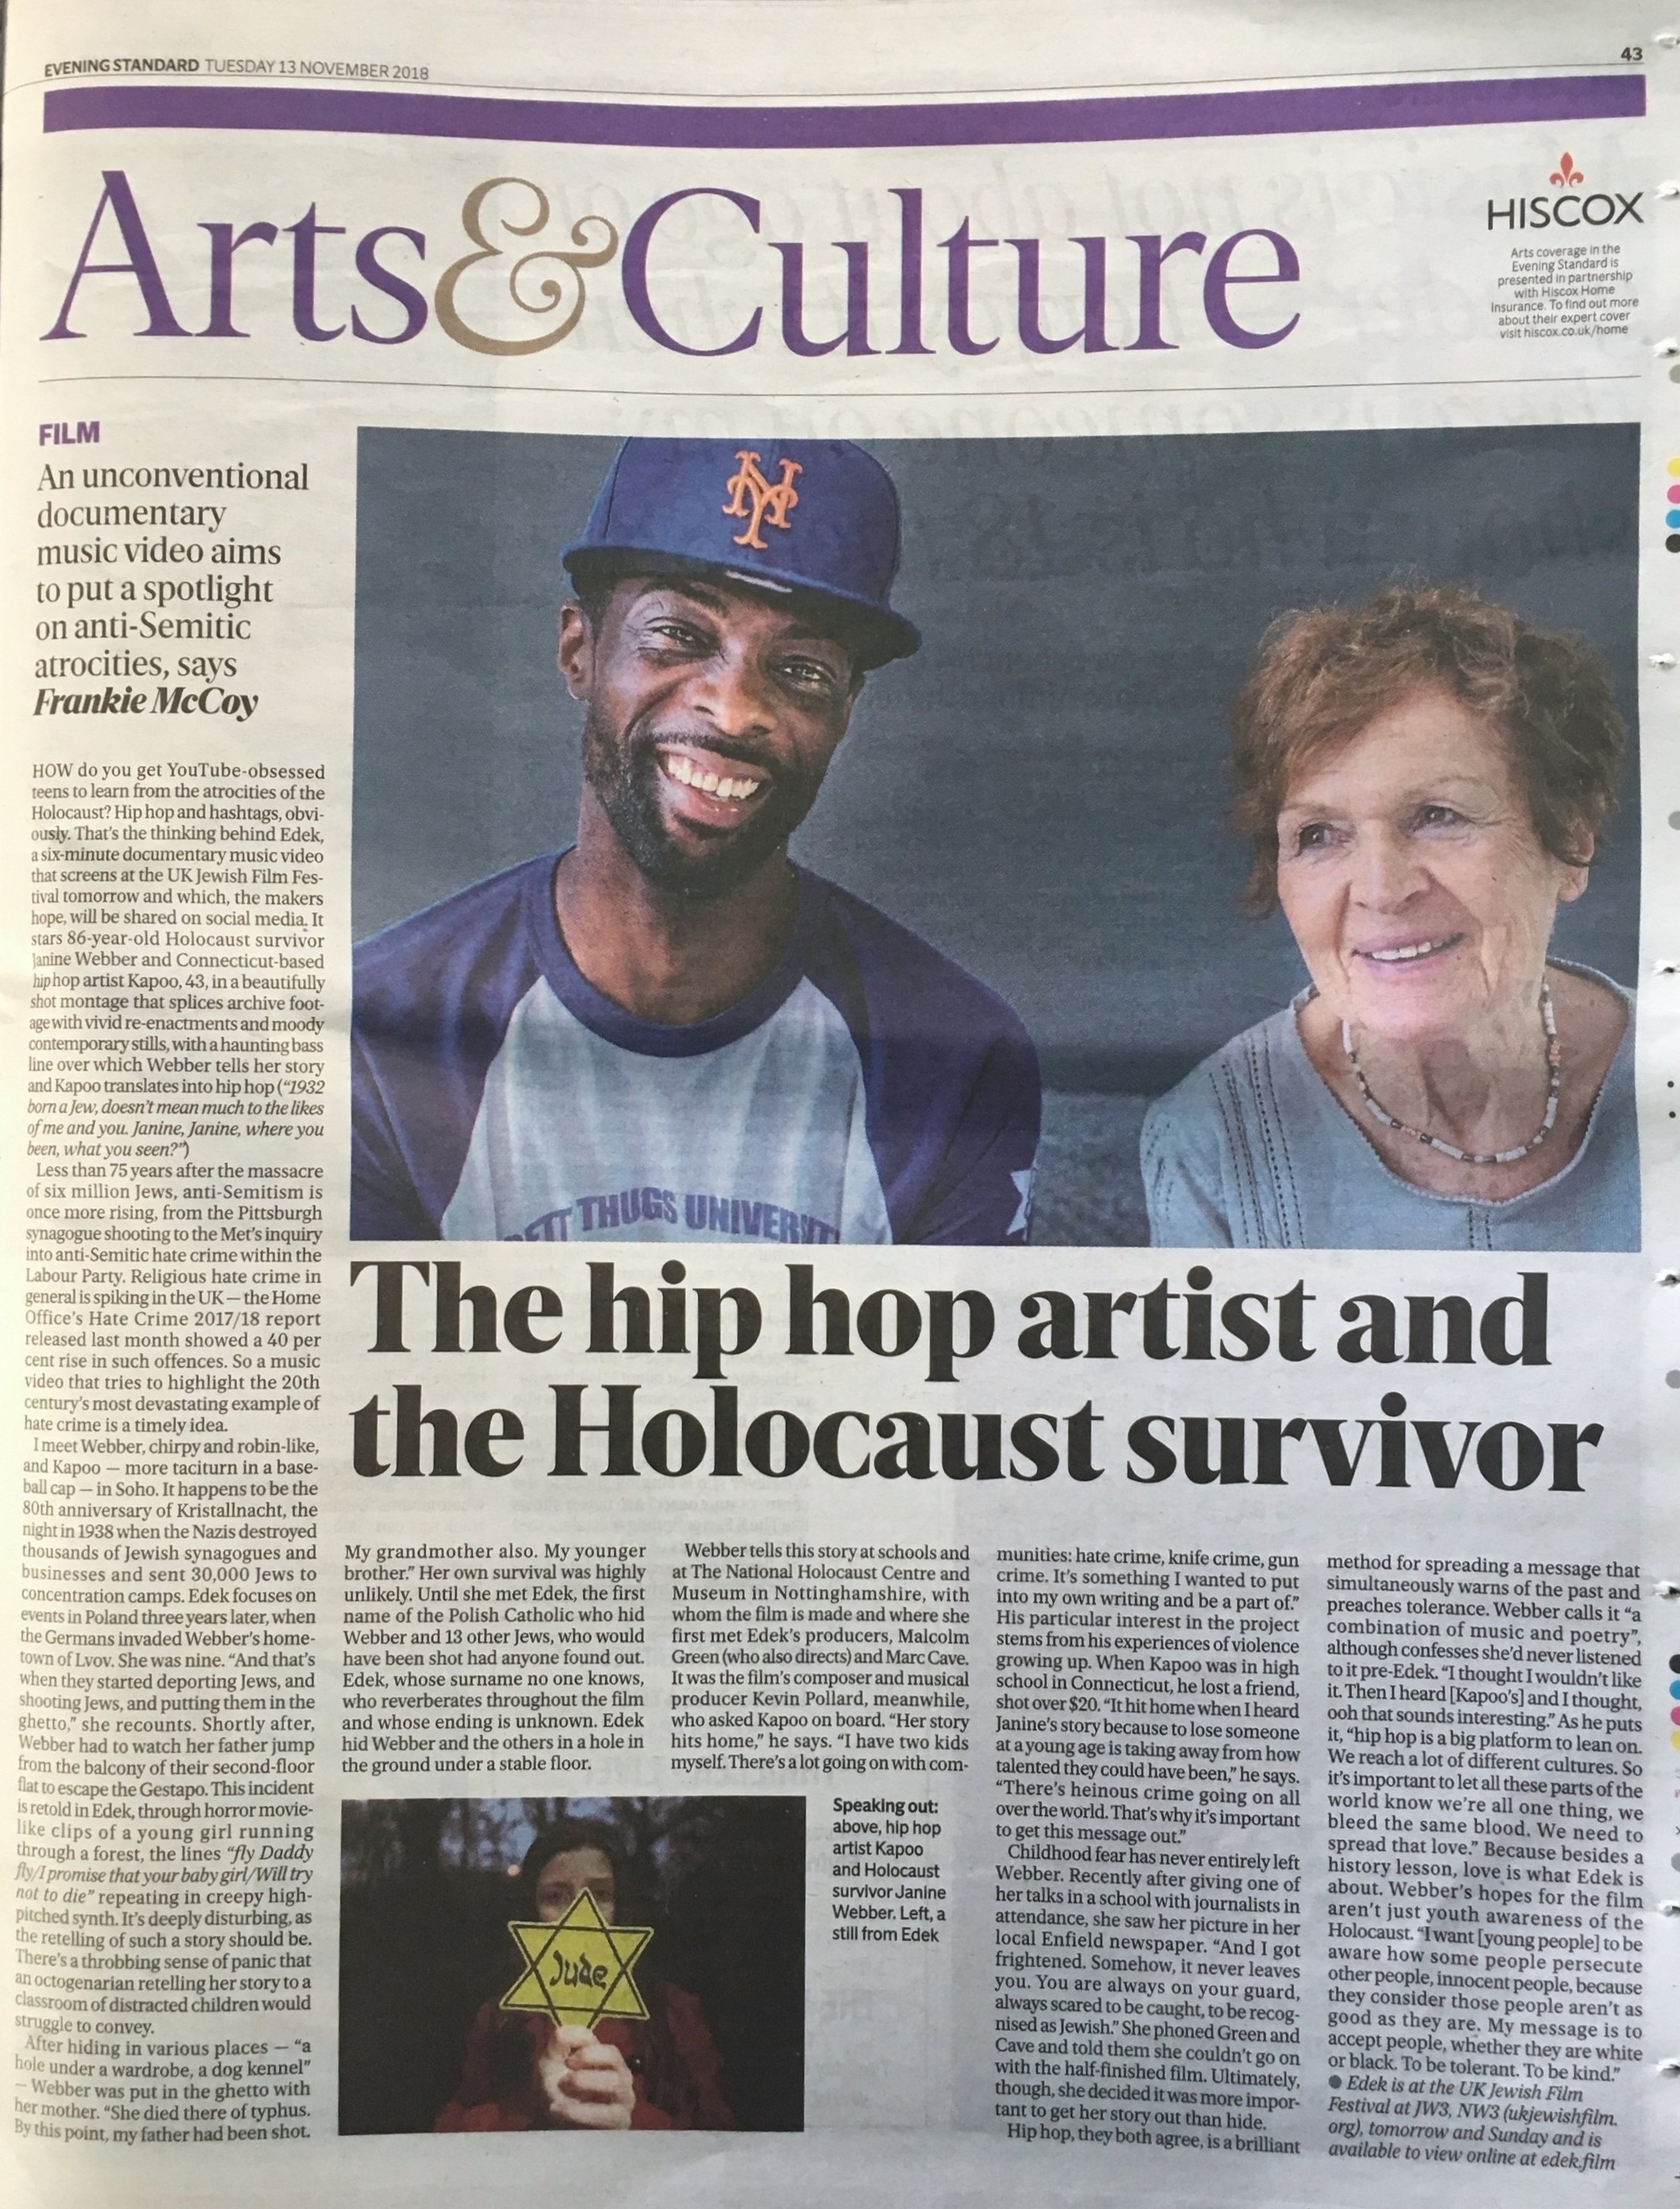 Evening Standard November 2018 -